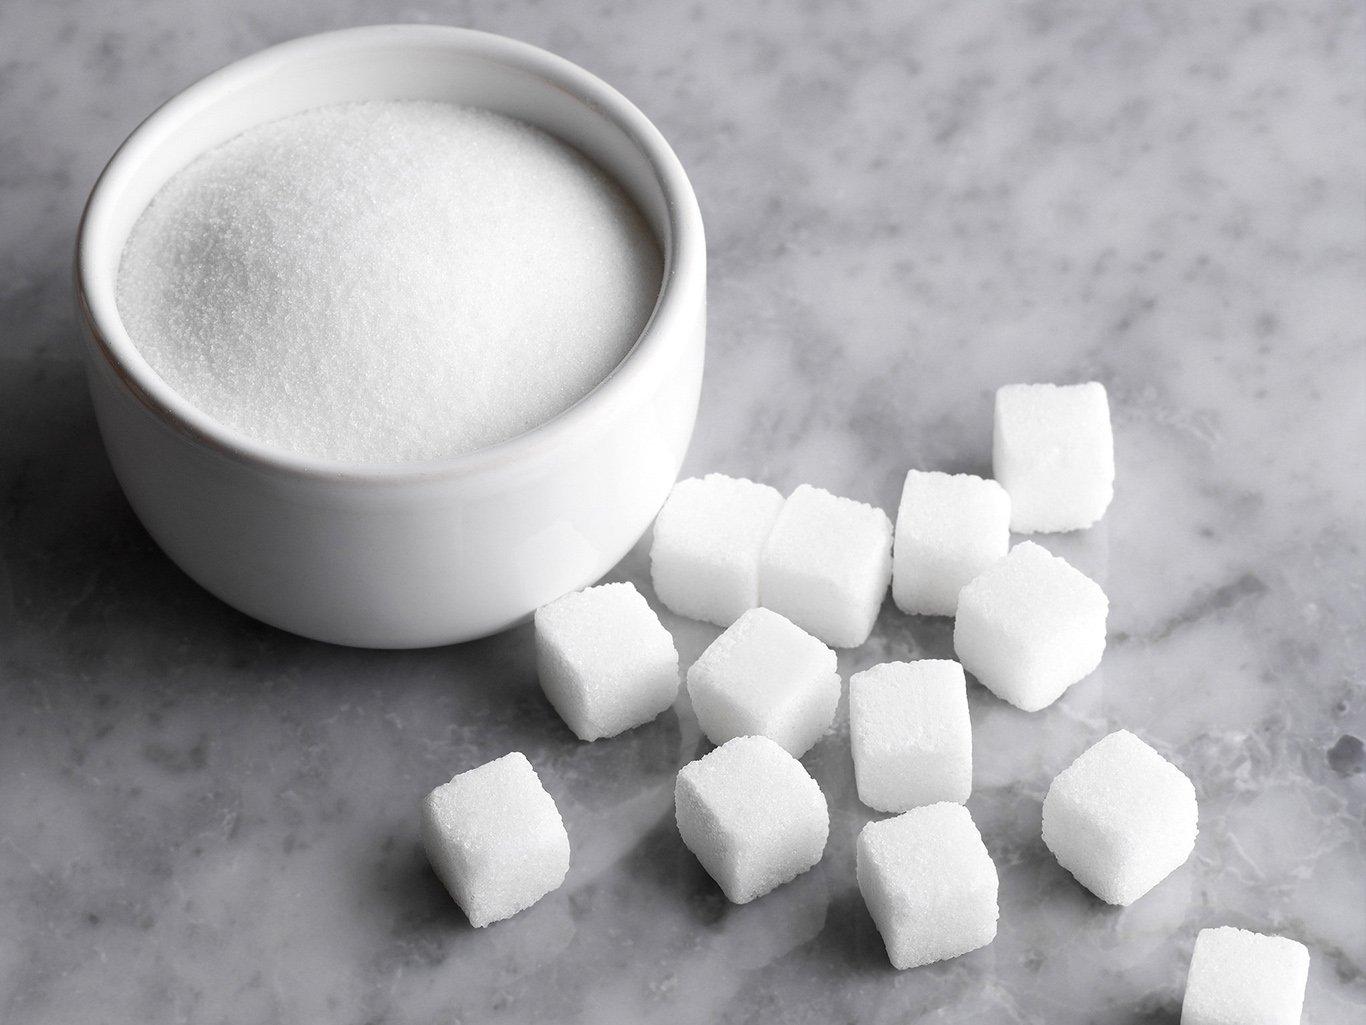 Сахар картинки с надписями, приколы